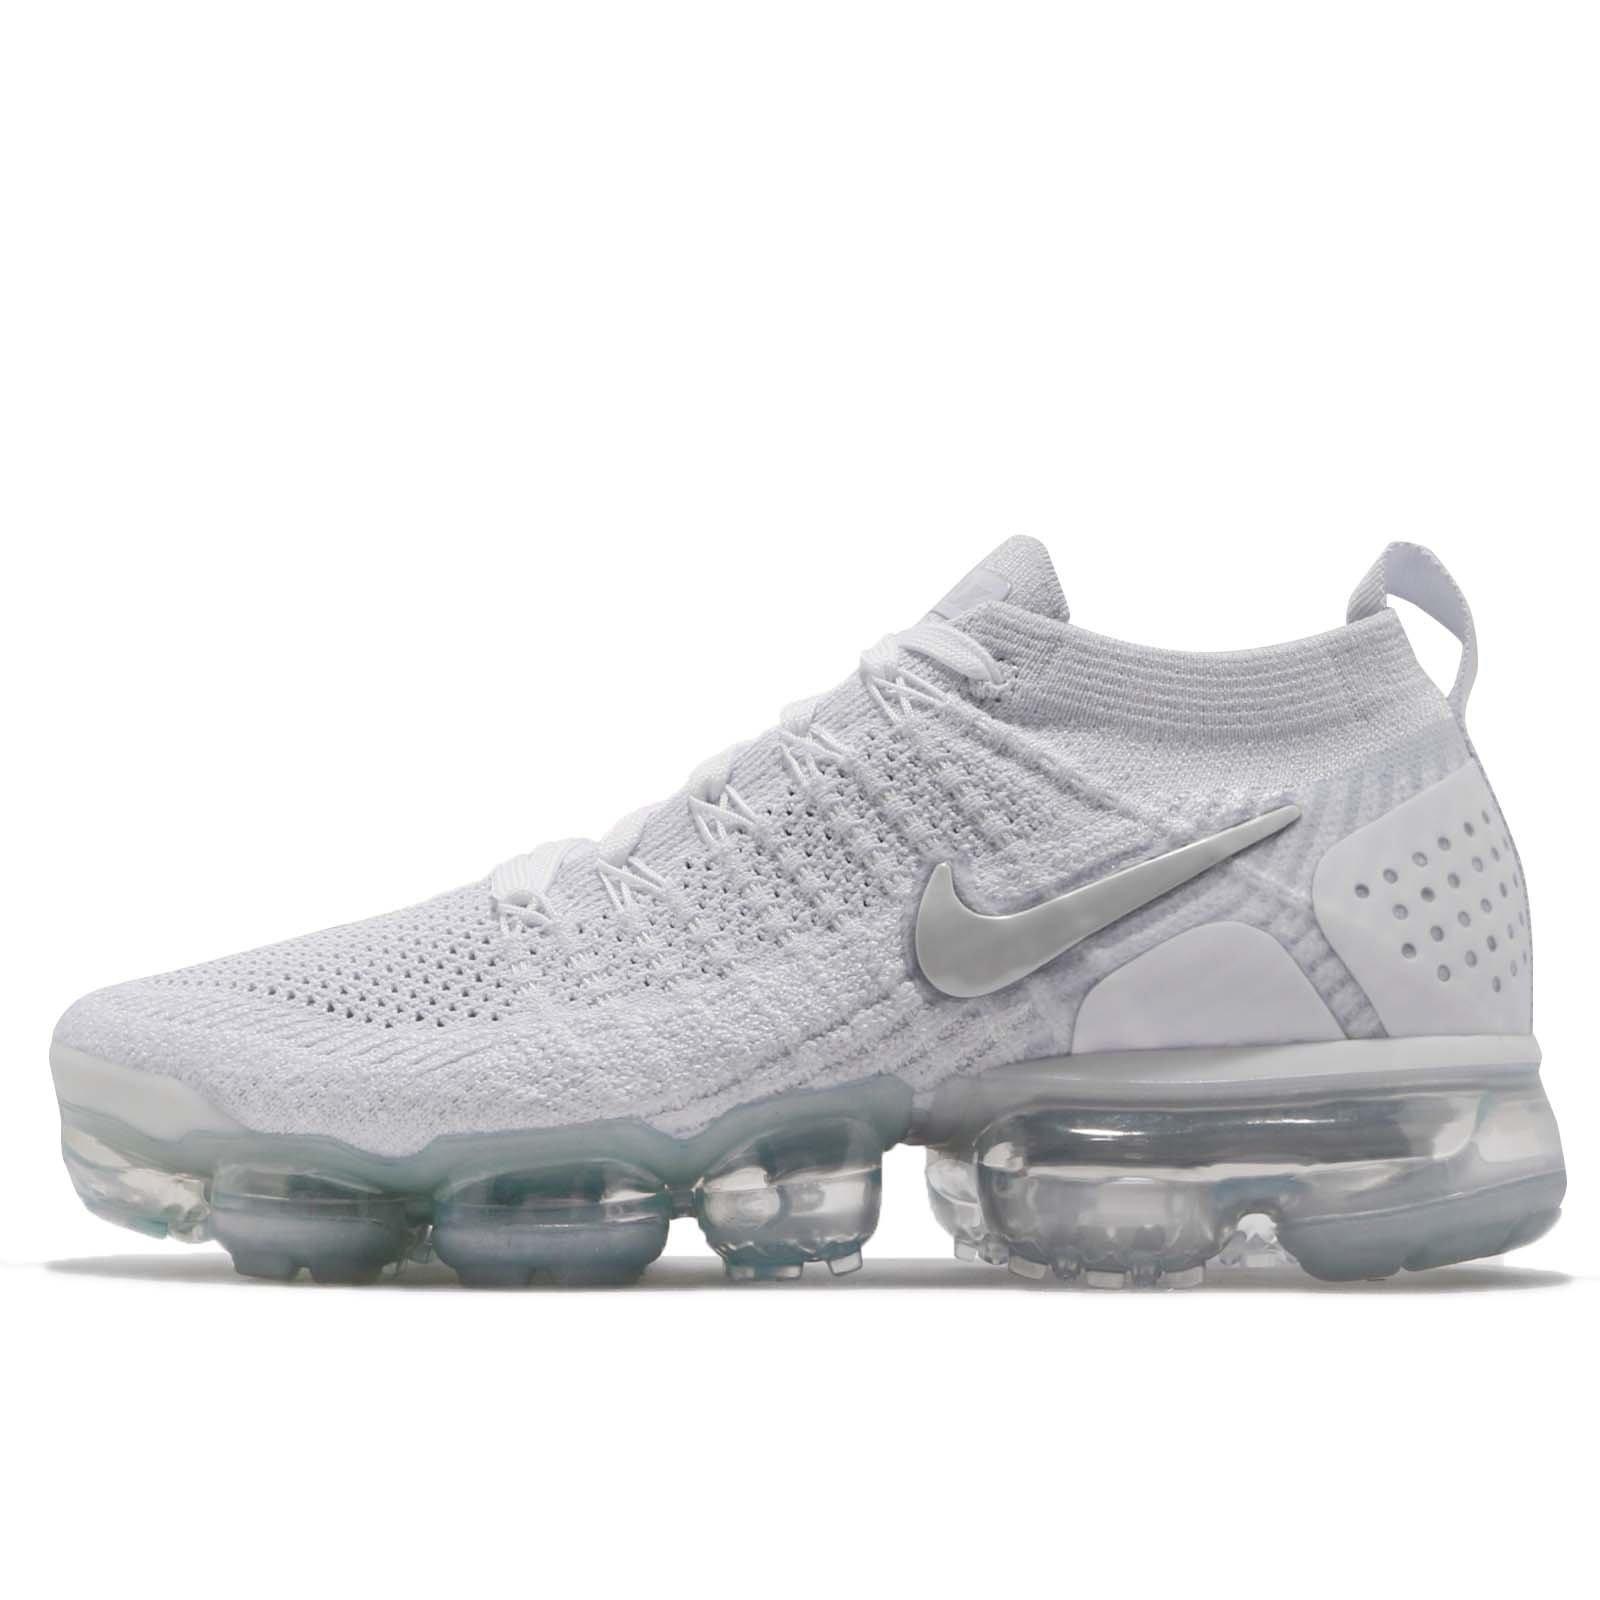 80a87406acb3 Galleon - NIKE Women s Air Vapormax Flyknit 2 Running Shoes (9.5